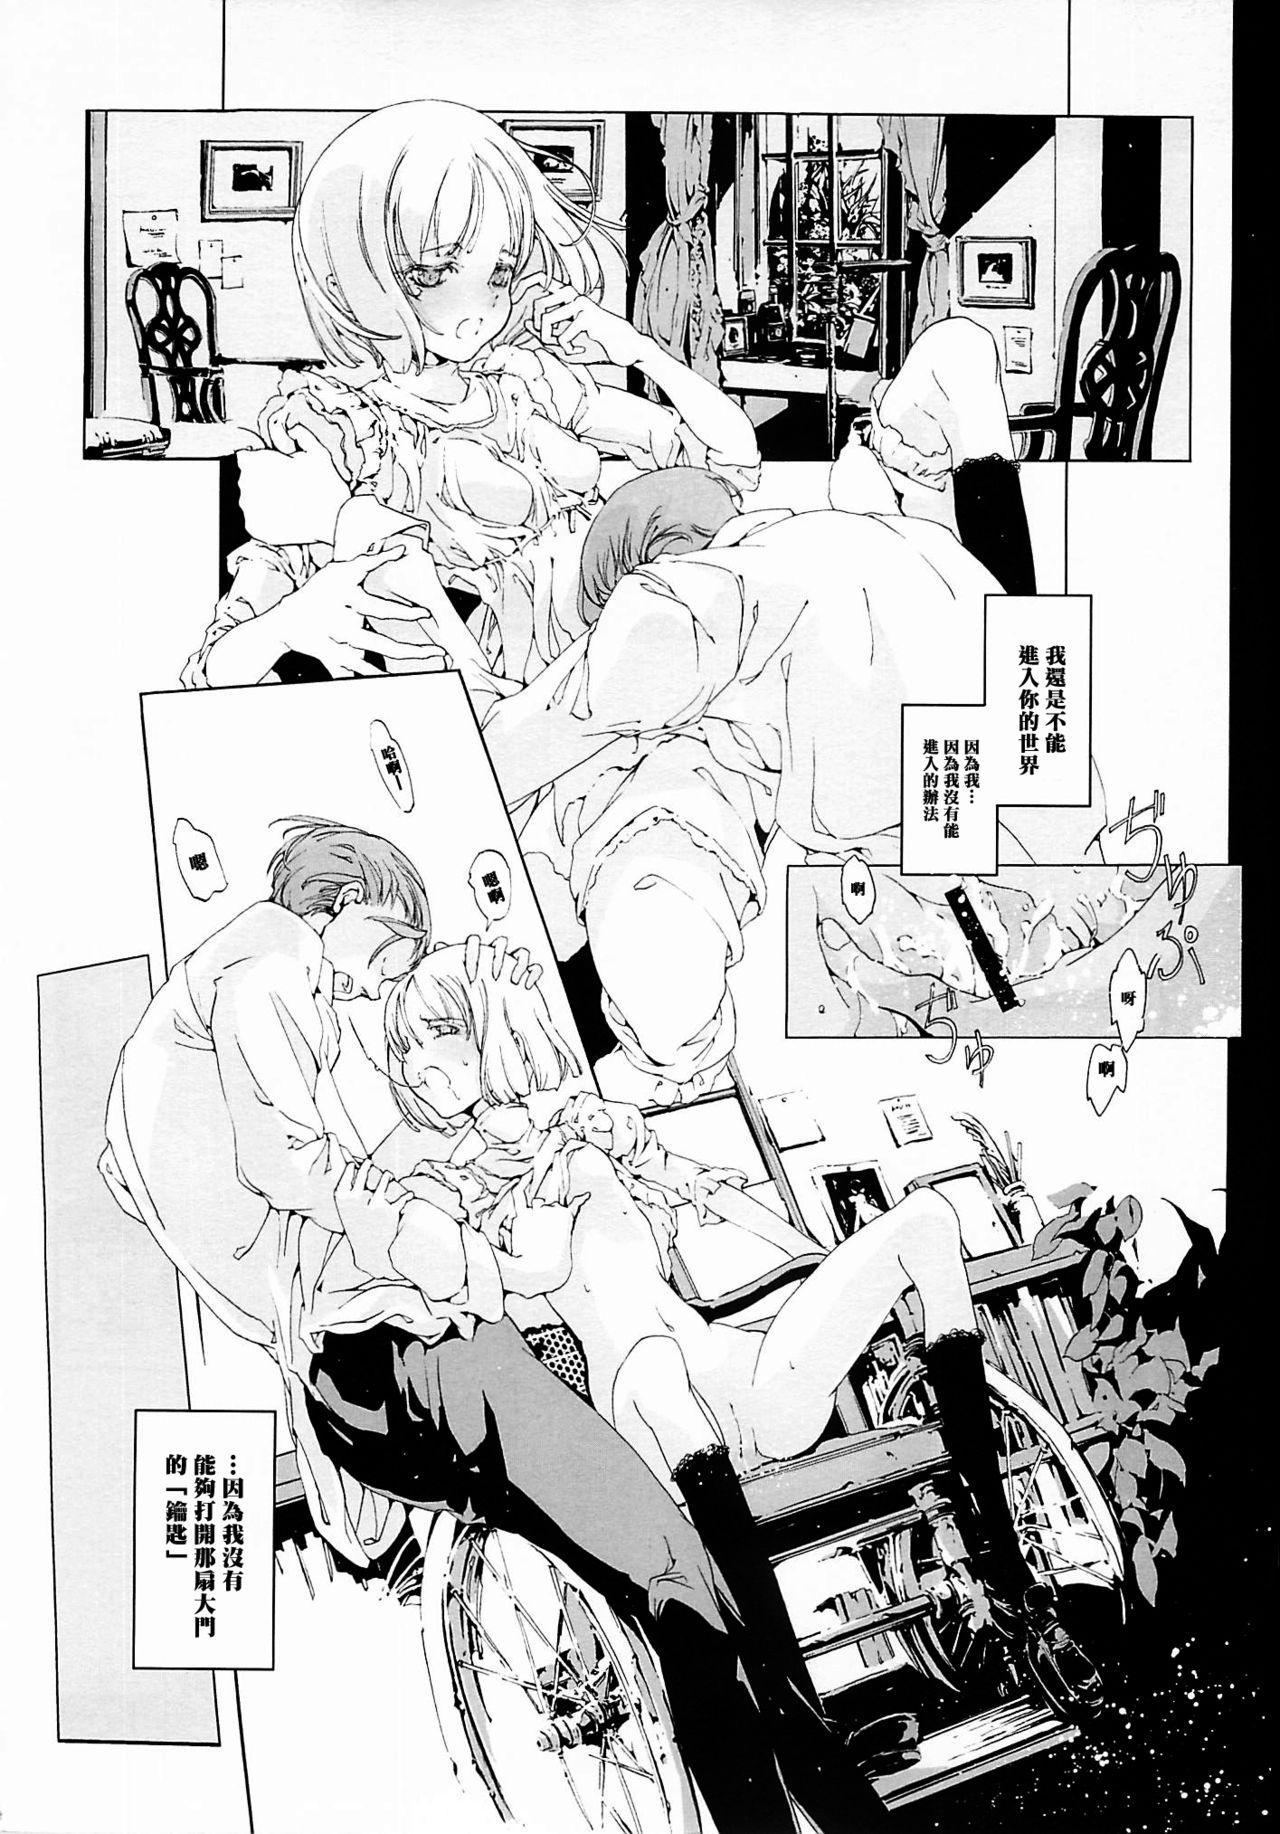 (CR37) [70 Nenshiki Yuukyuu Kikan (Endou Okito)] ORGAN-Tino  01-02[Chinese] [拾荒者汉化组] [Incomplete] 93